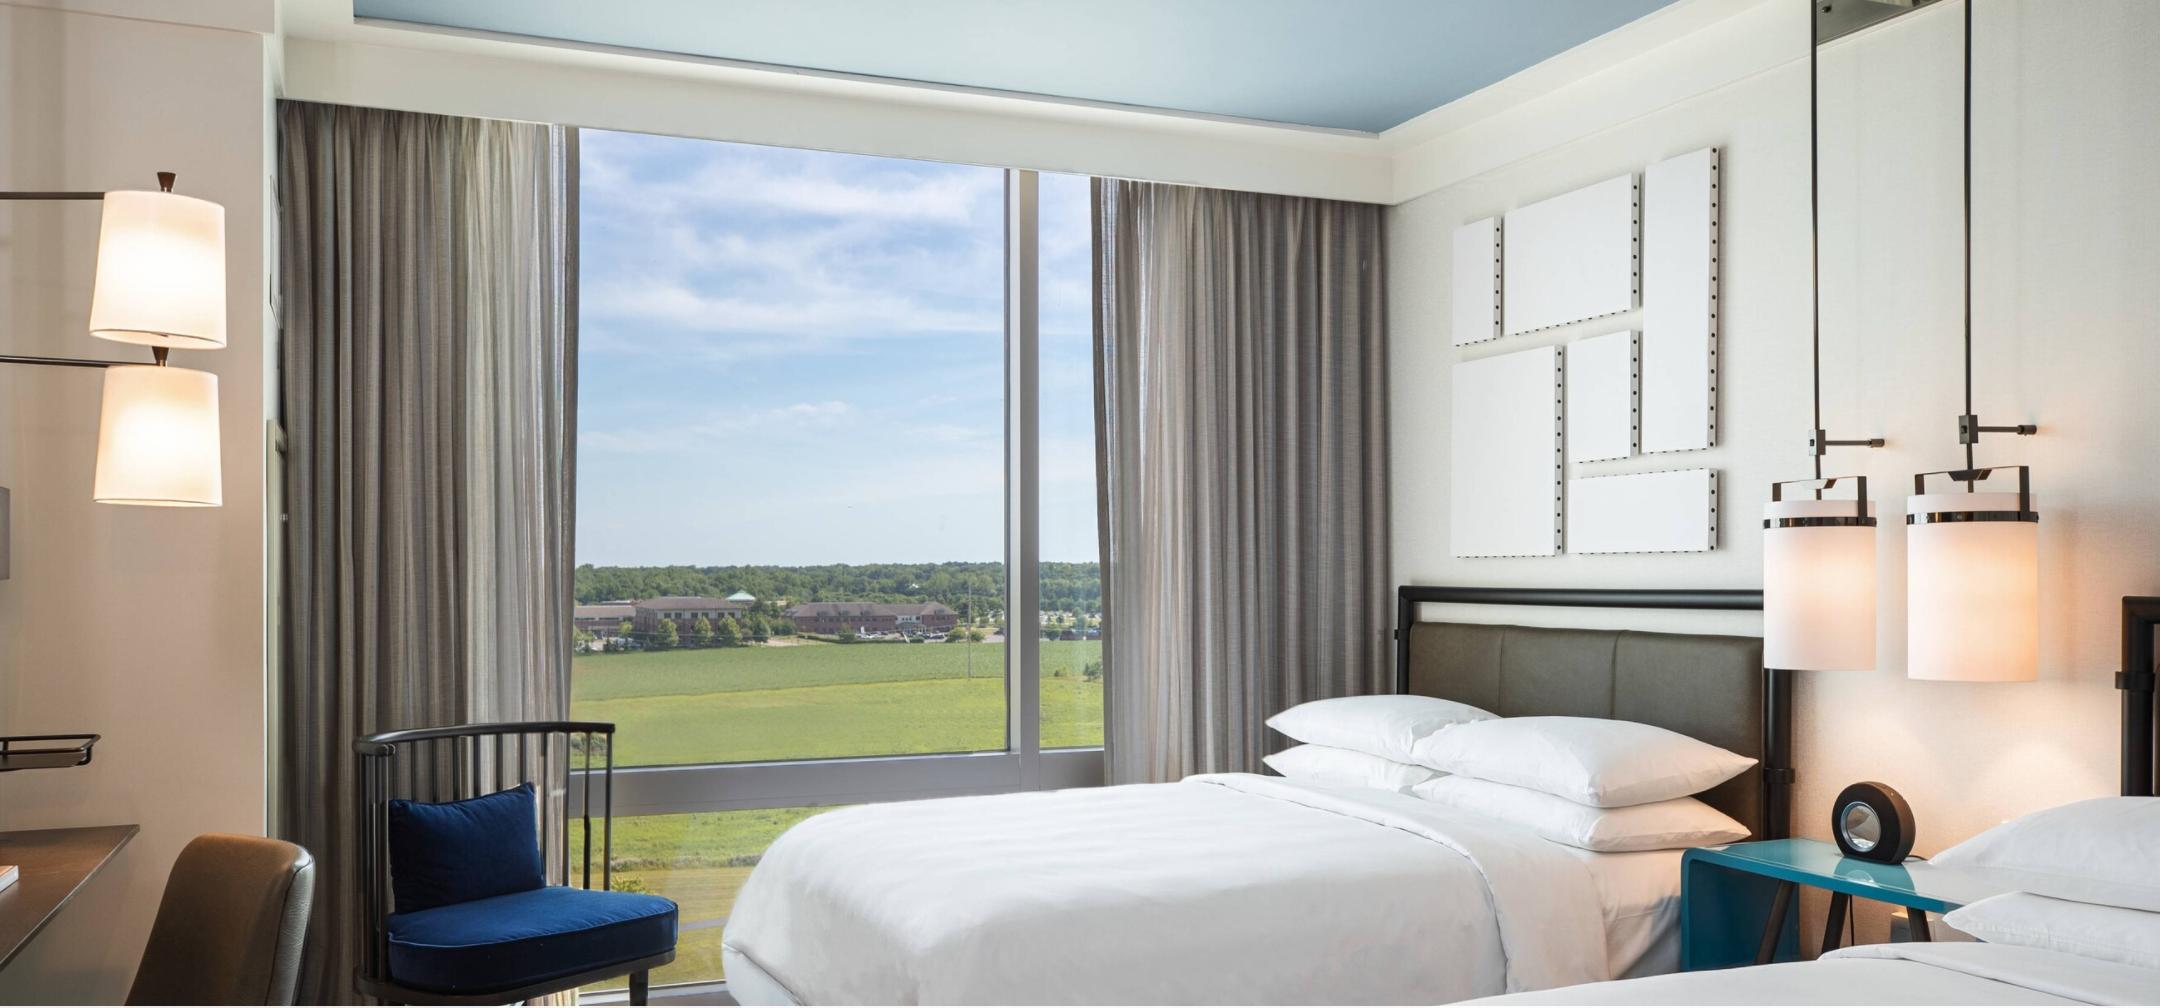 https://www.hotelsbyday.com/_data/default-hotel_image/3/18532/screenshot-2020-06-12-at-5-31-05-pm.png